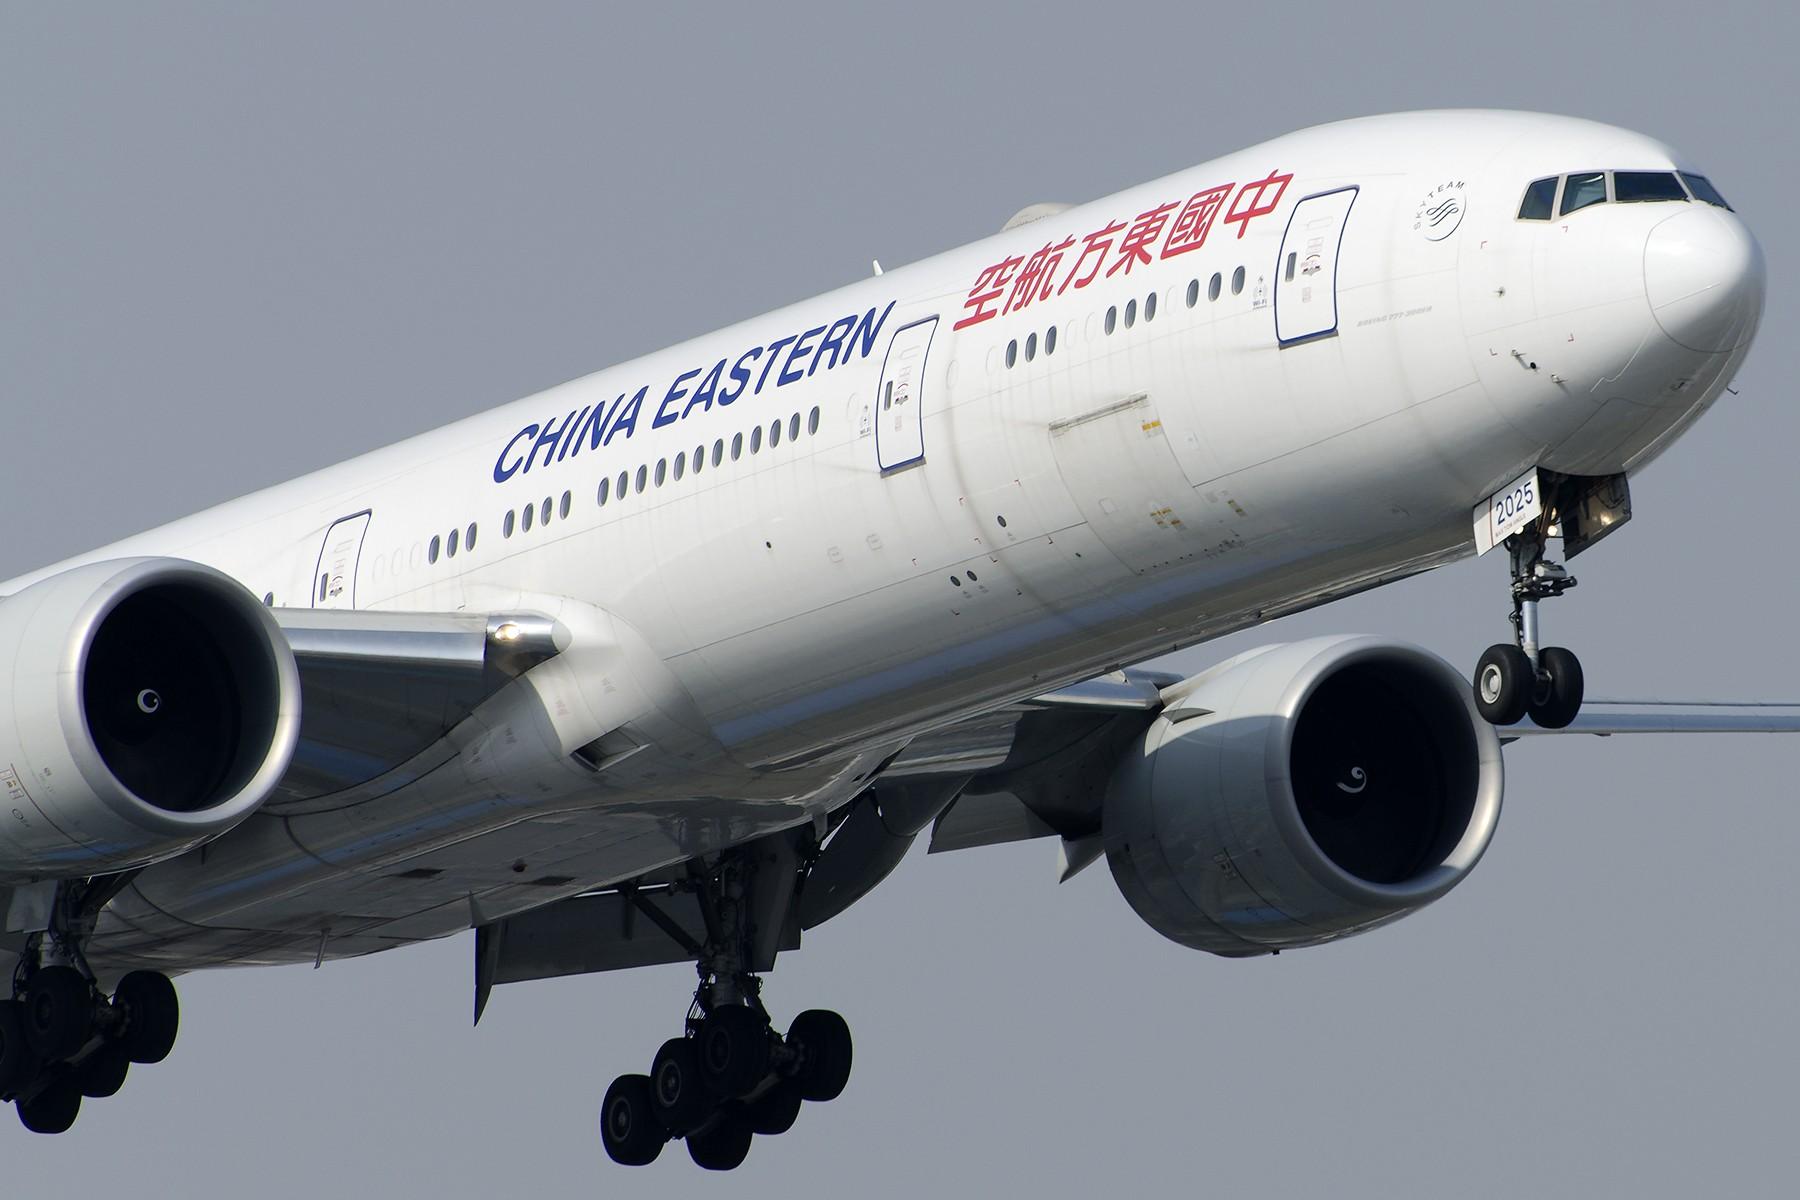 Re:[原创][原创]【SHA拍机*1800大图】4月拍的了,记得那天好货还挺多 BOEING 777-300ER B-2025 中国上海虹桥国际机场